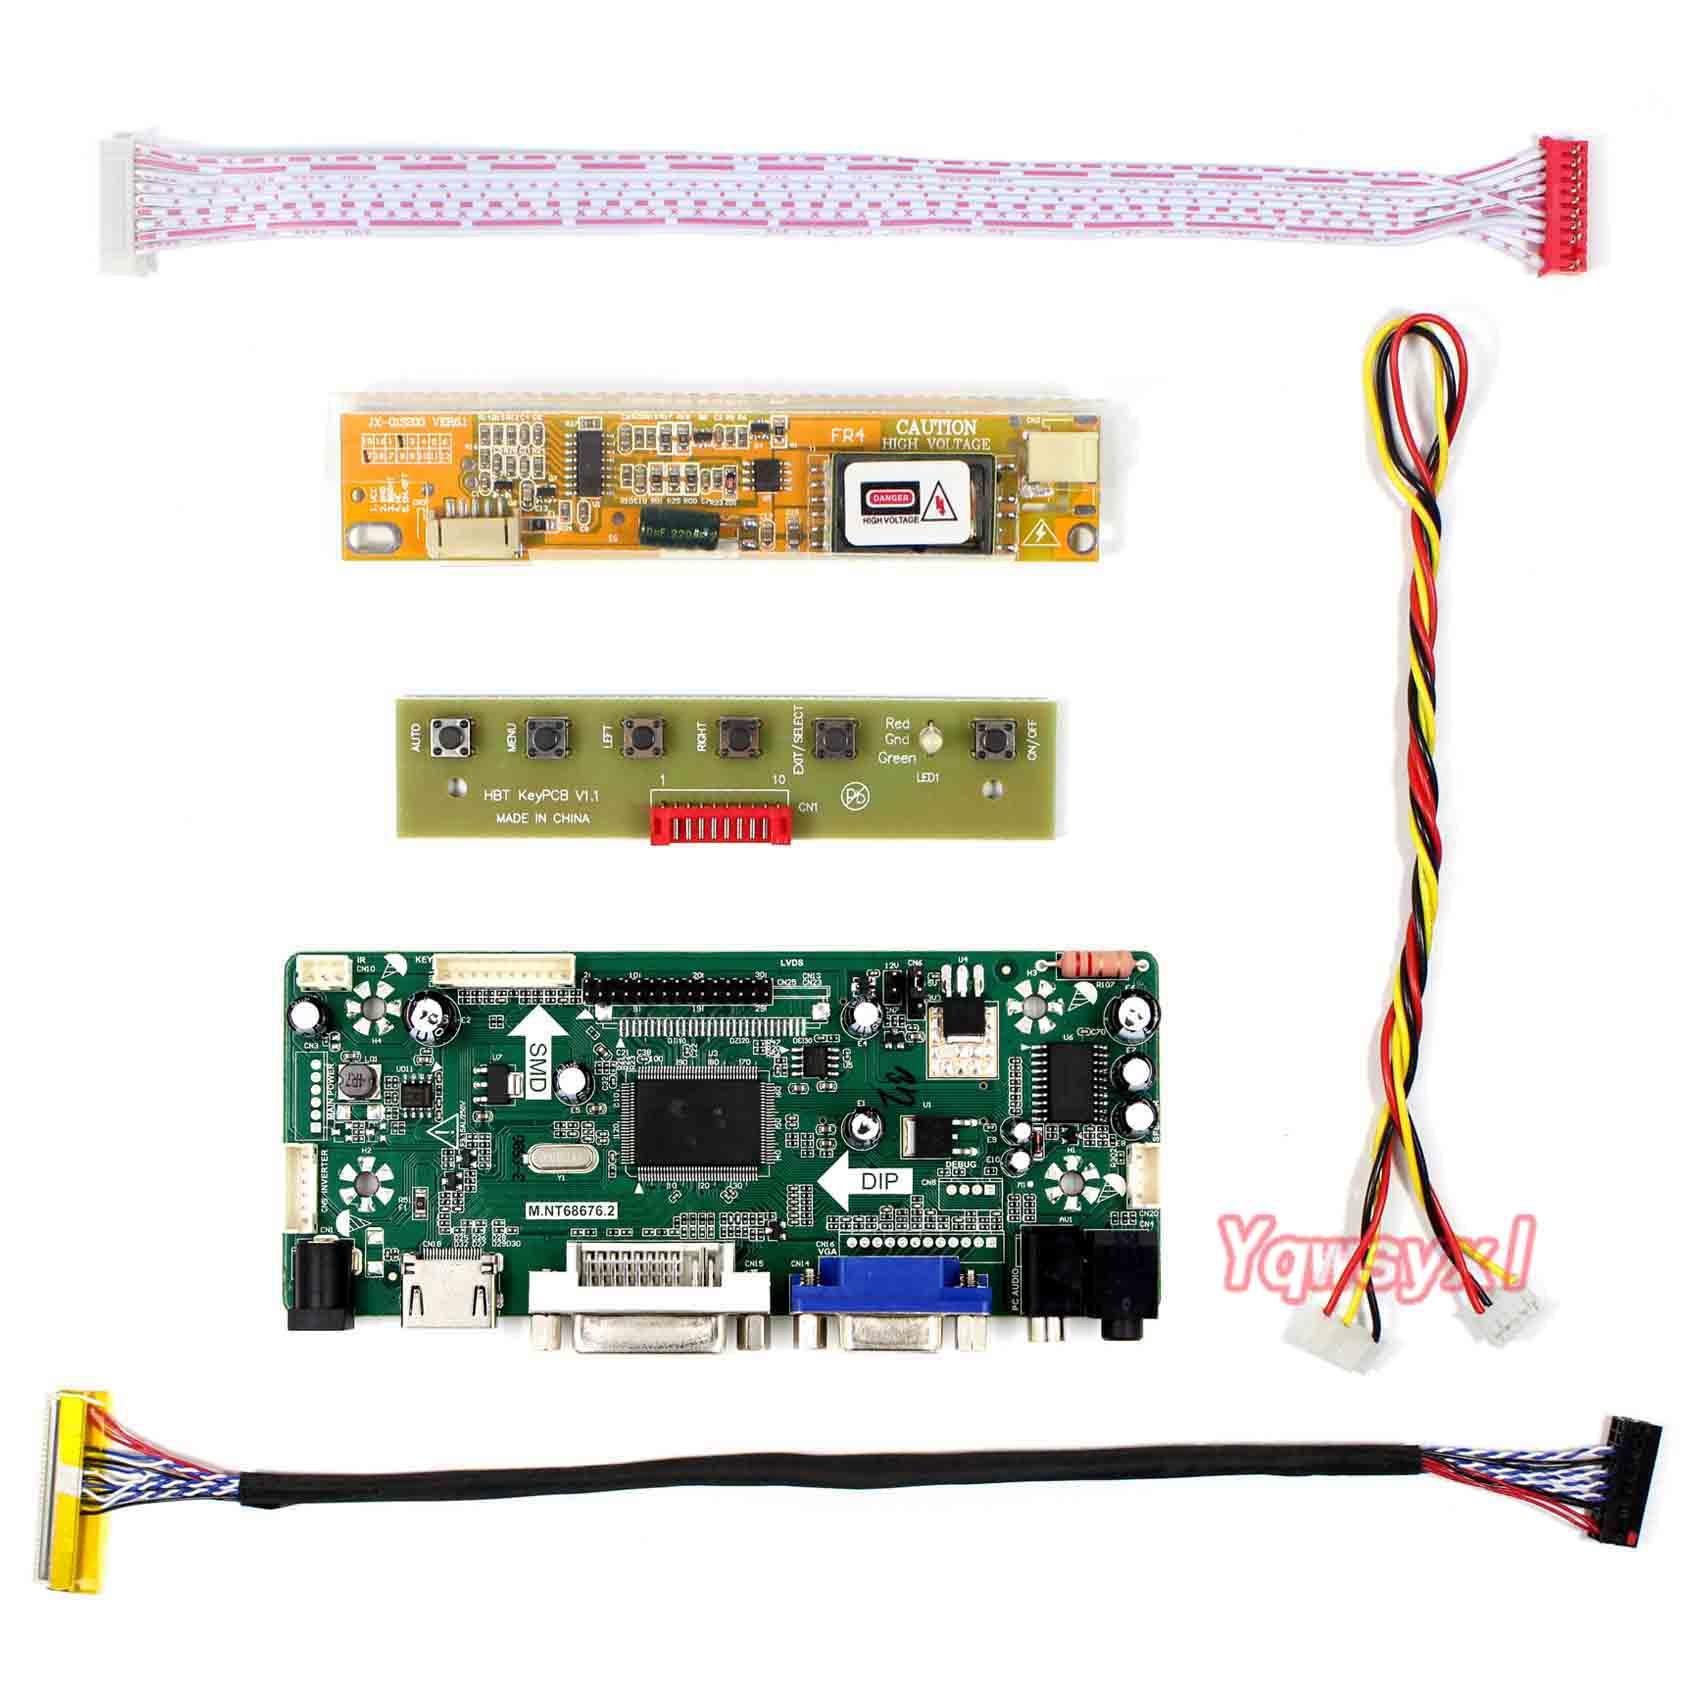 Yqwsyxl Control Board Monitor Kit For N154C3-L01 N154C3-L02 HDMI+DVI+VGA LCD LED Screen Controller Board Driver